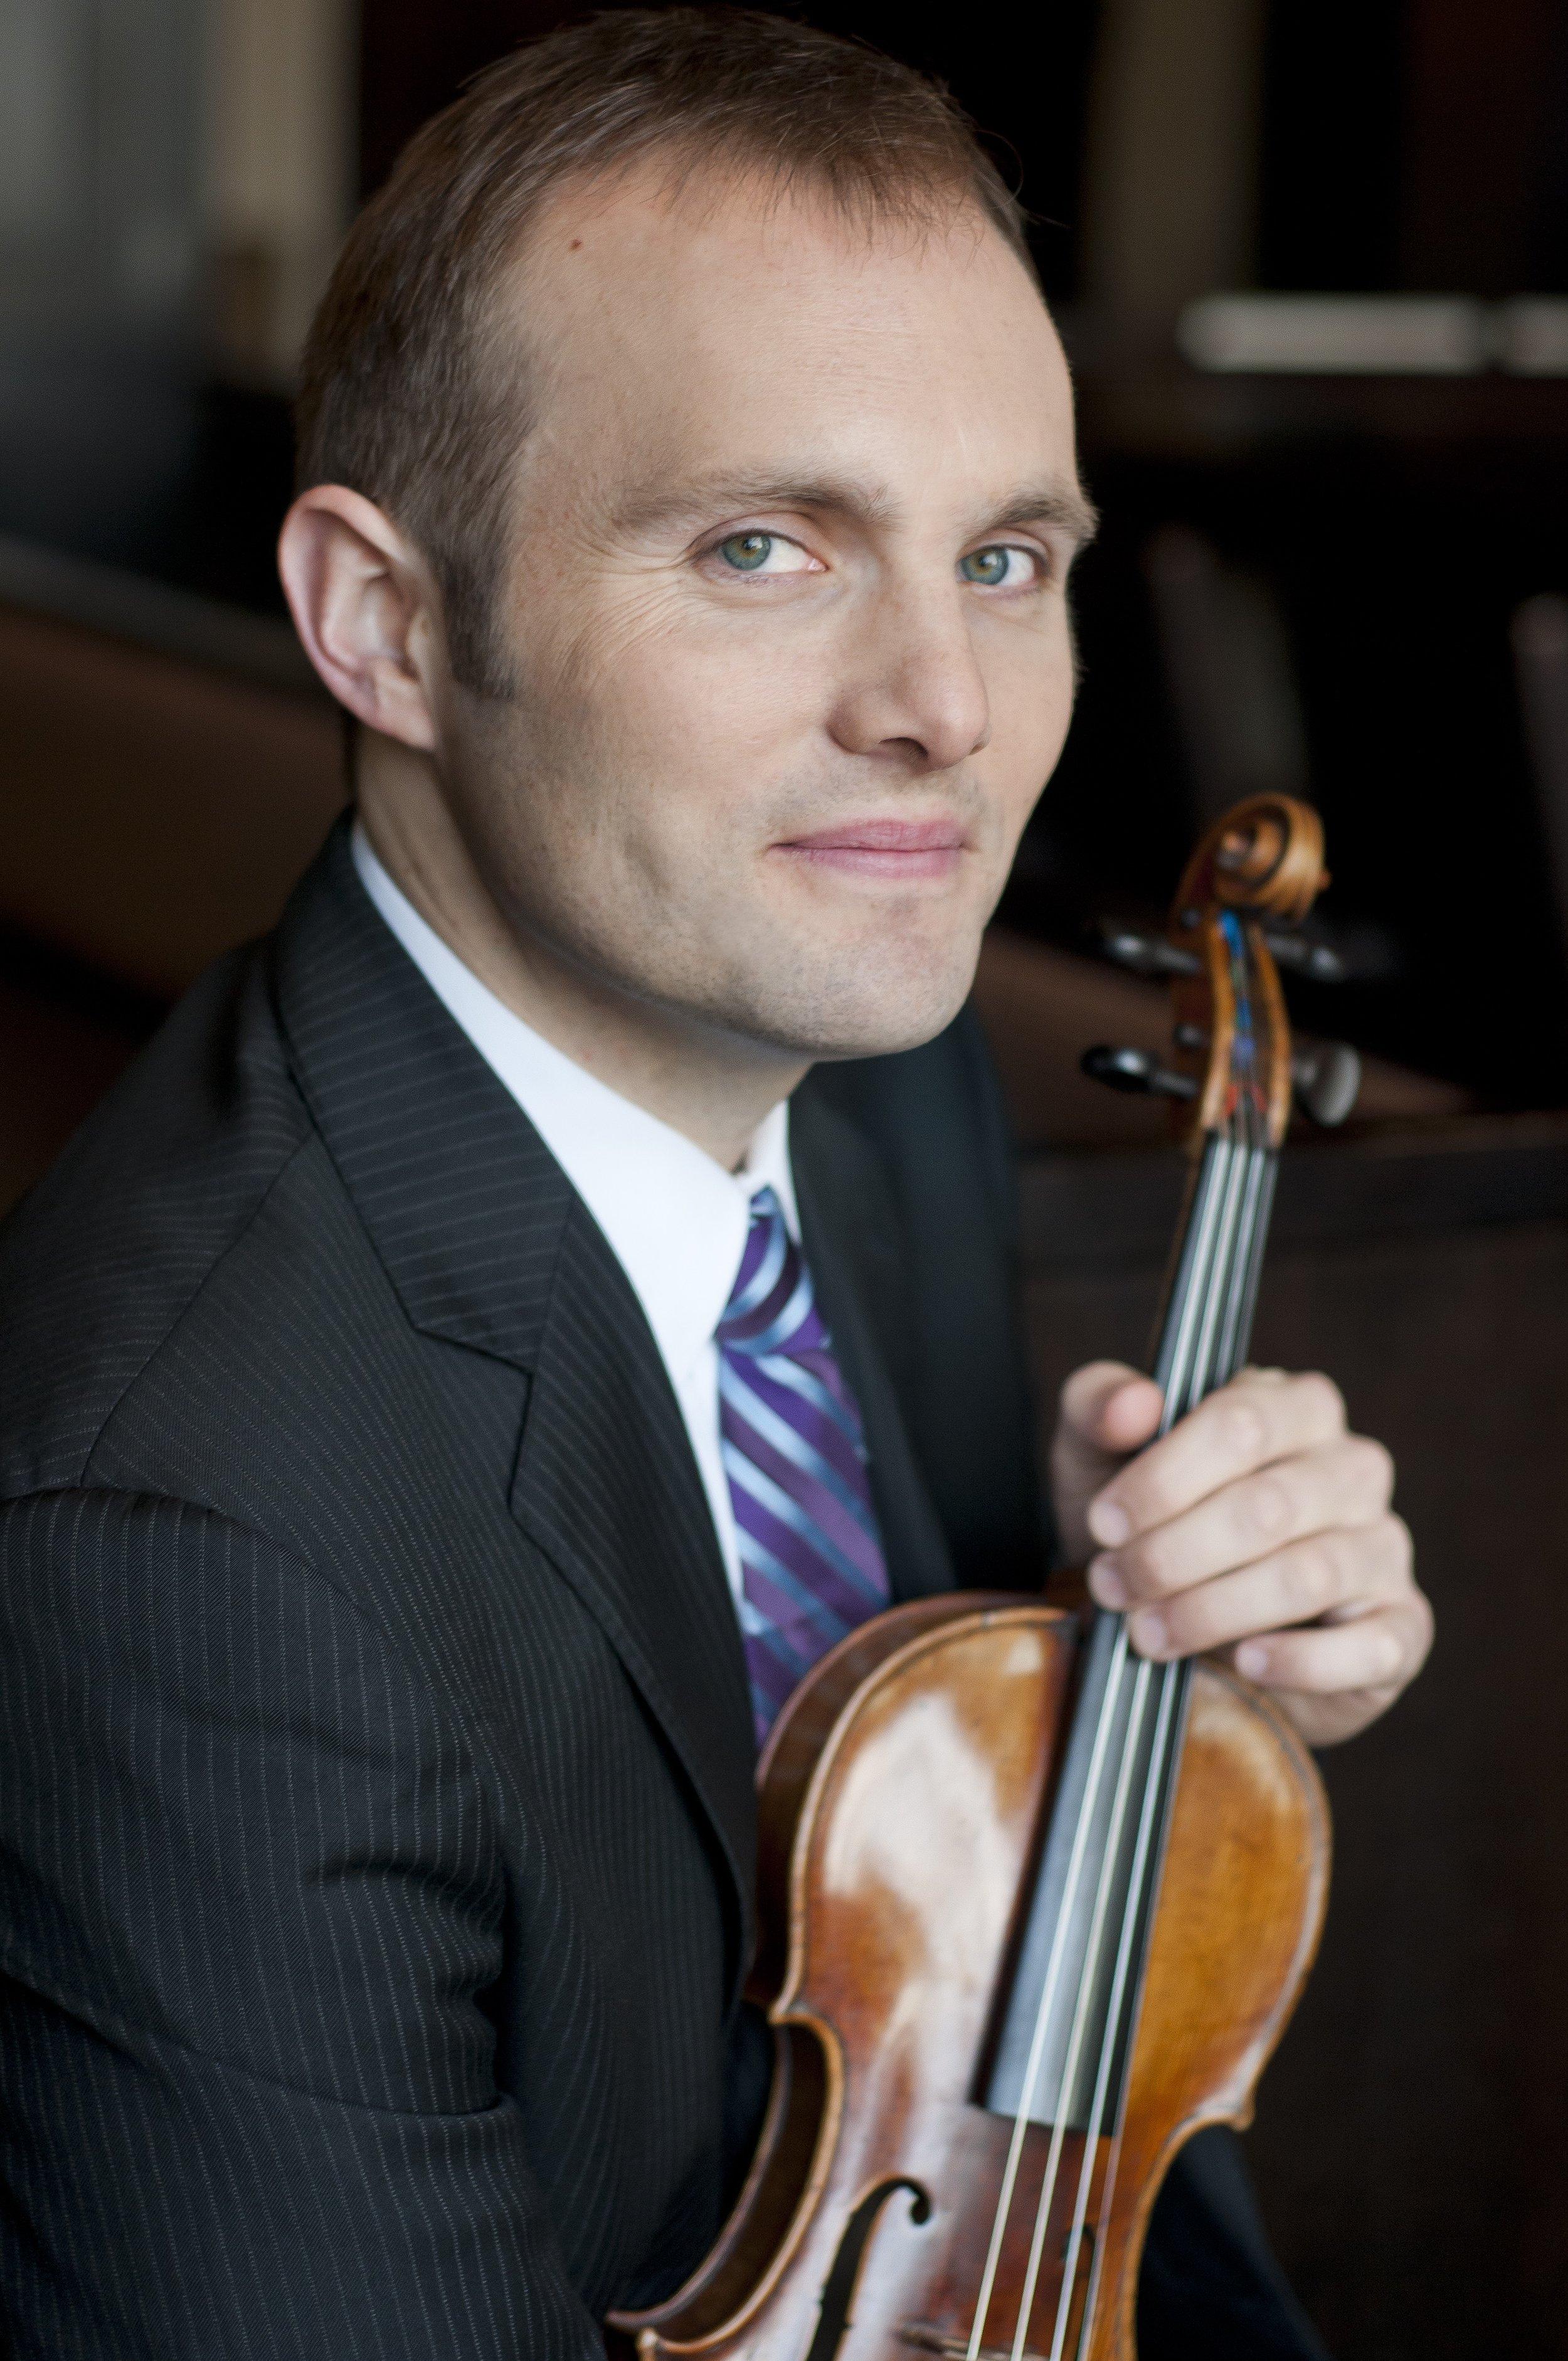 J Freivogel, violin I photo by Vanessa Briceno-Scherzer